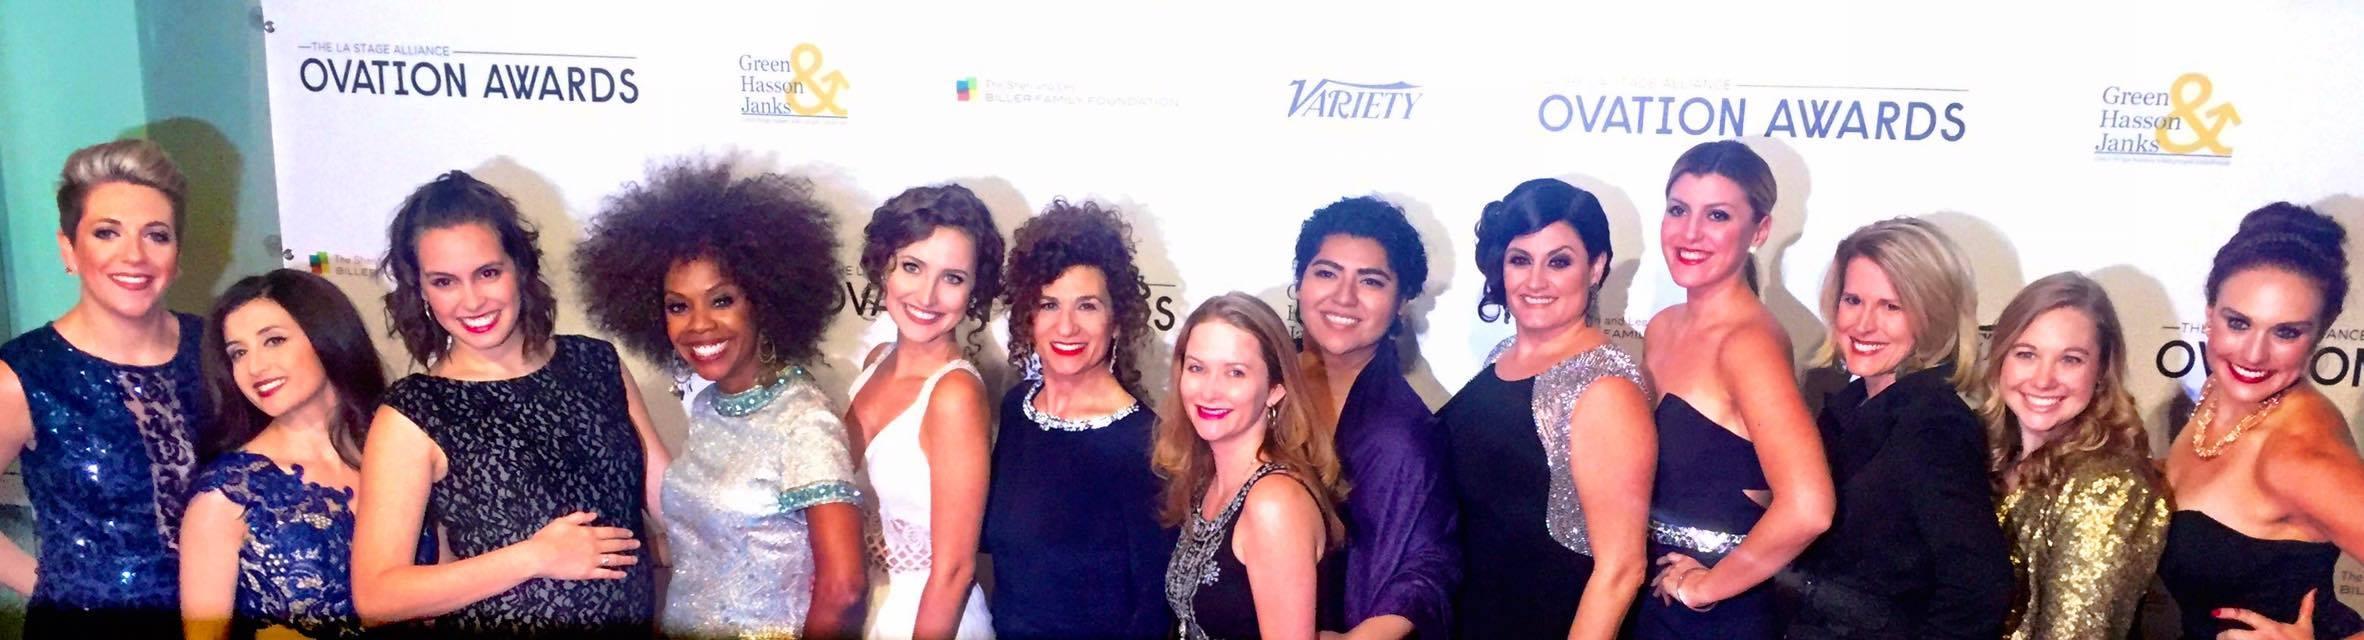 2016 Ovation Awards